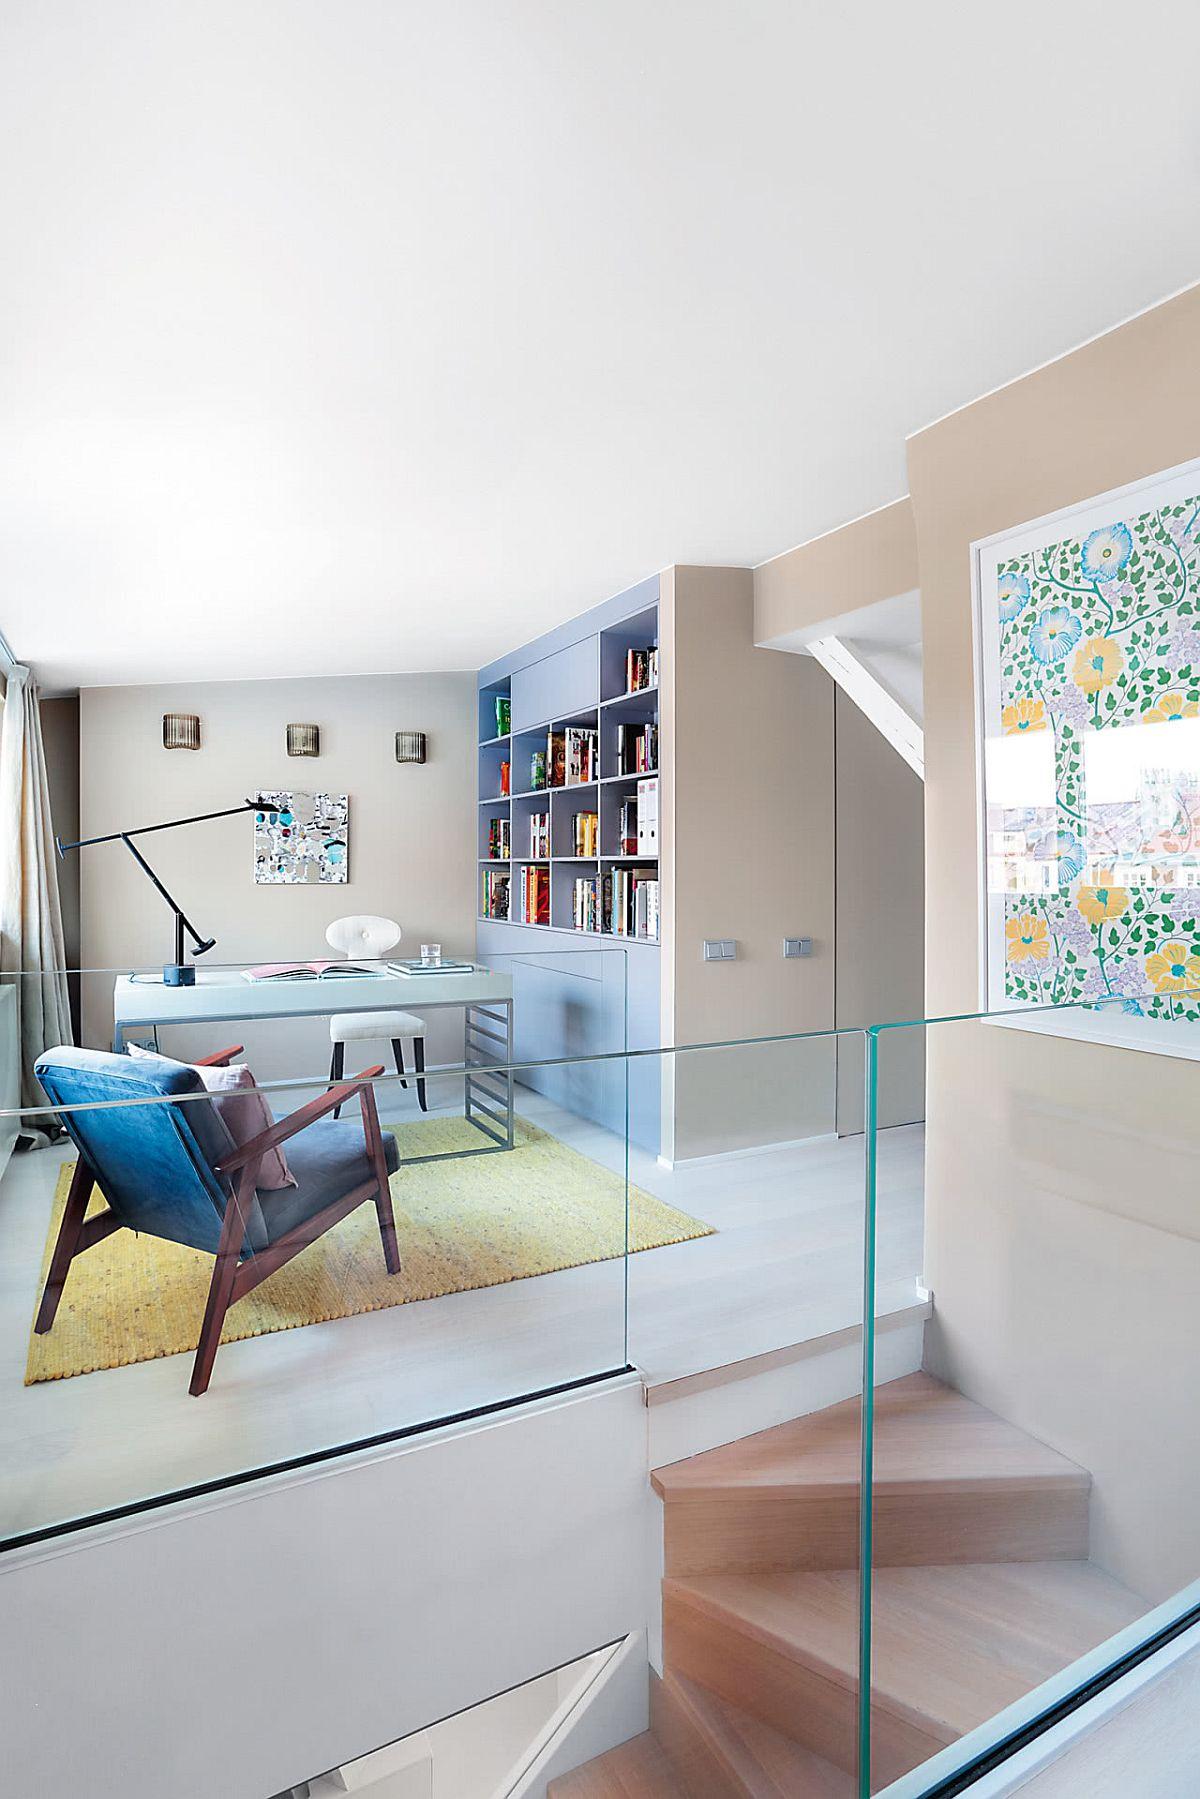 adelaparvu.vom despre amenajare mansarda in nuante pastelate, design Maria Rosaria Bocciuni, Foto Aneta Tryczynska (5)